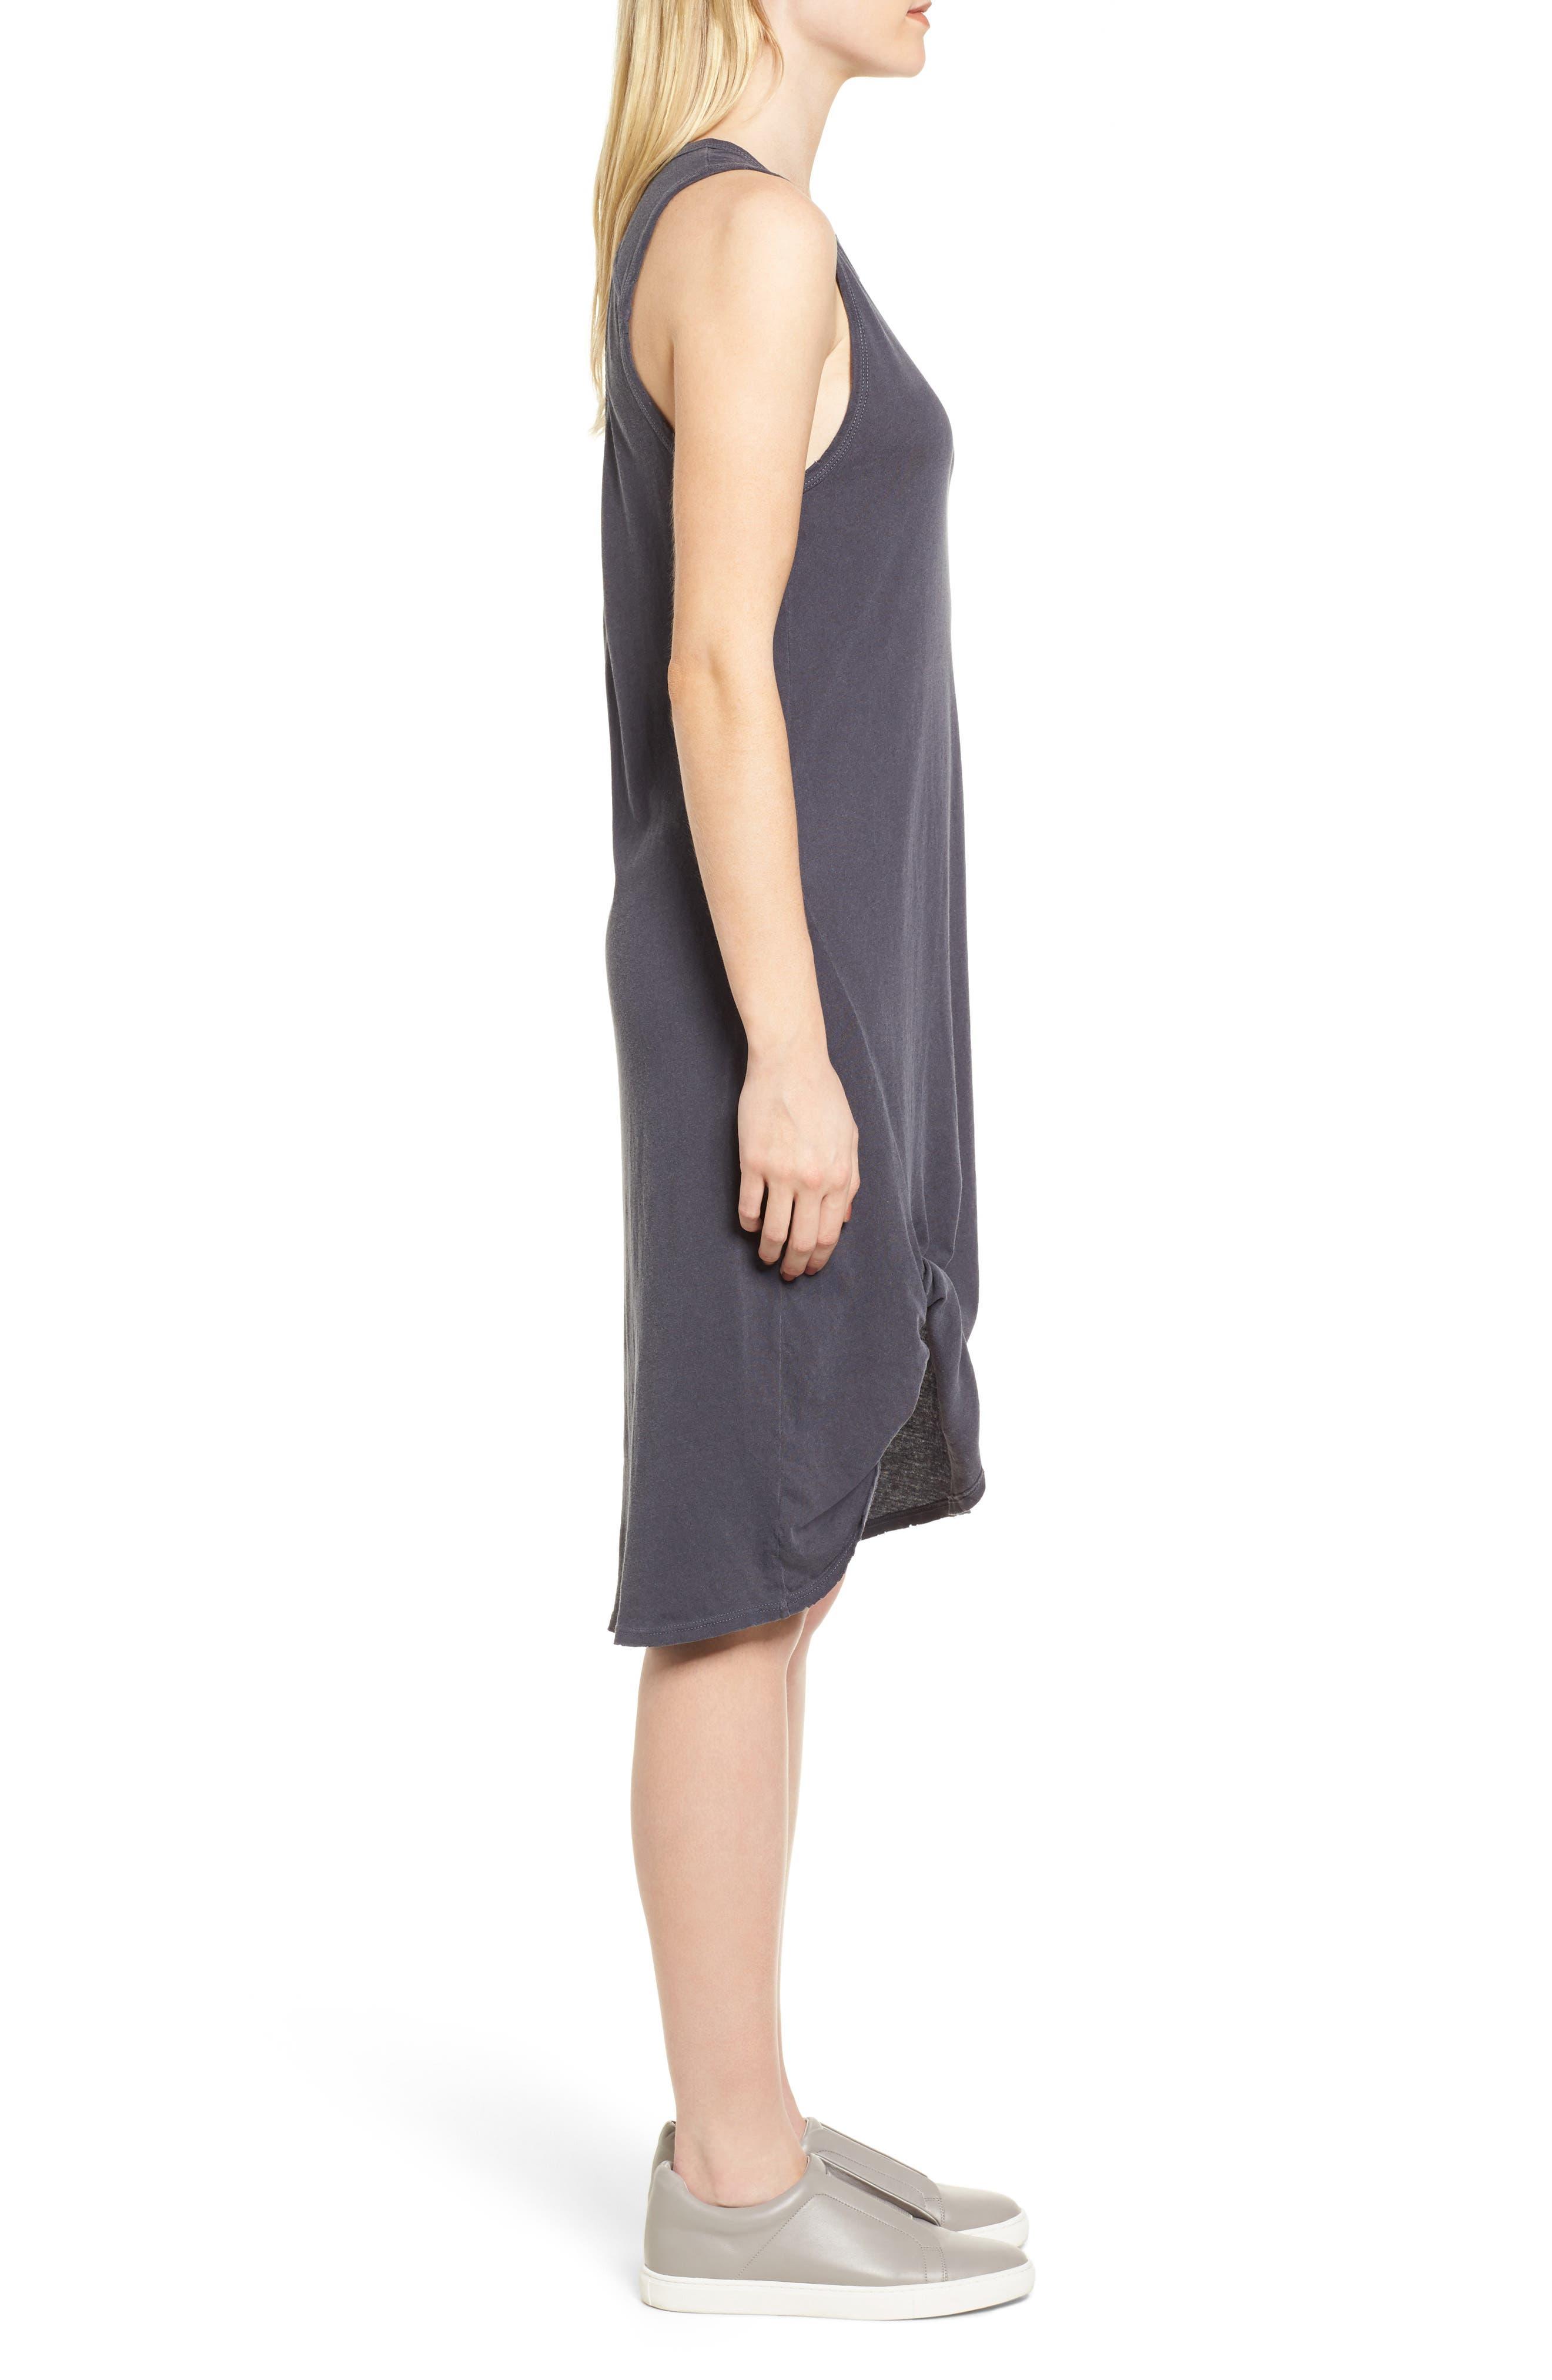 Boo Jersey Tank Dress,                             Alternate thumbnail 3, color,                             Asphalt